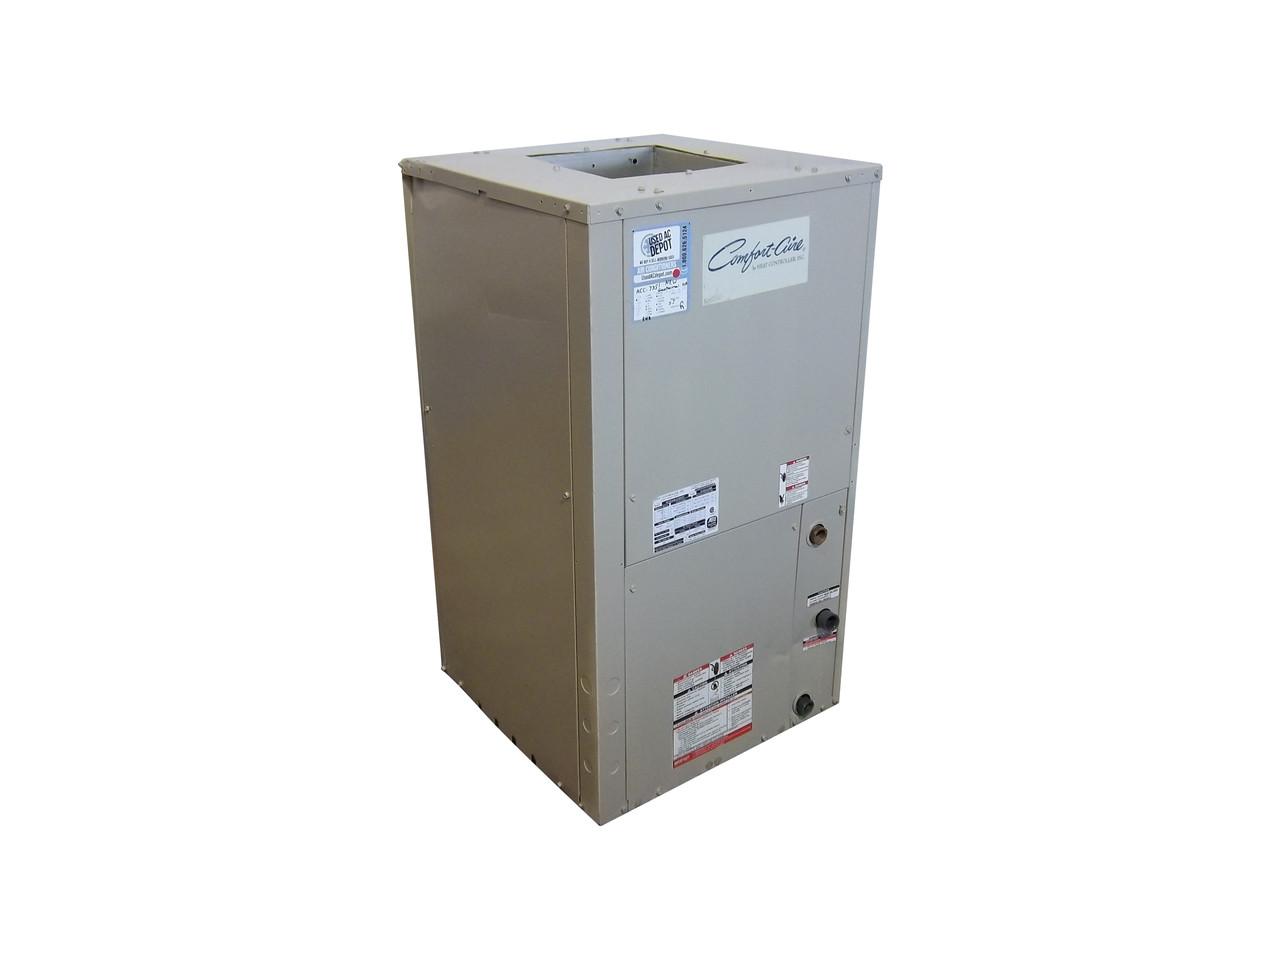 Air Temperature Units : Heat controller quot scratch dent central air conditioner